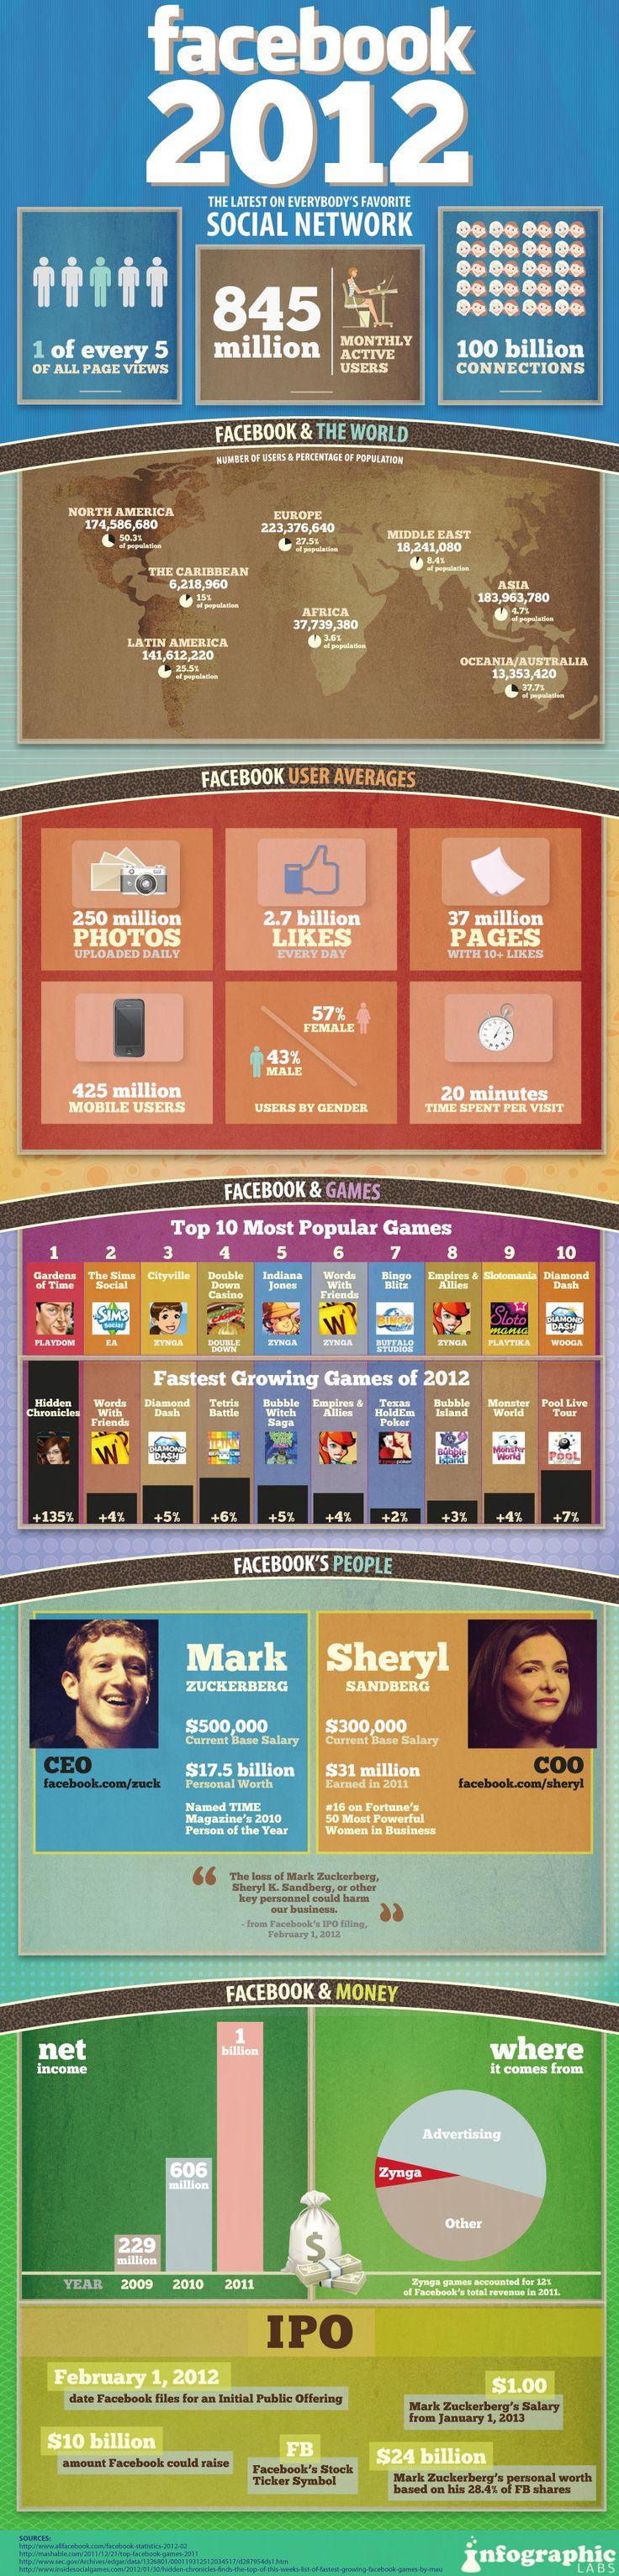 10 Interesting Facebook Infographics – Statistics Visualized!